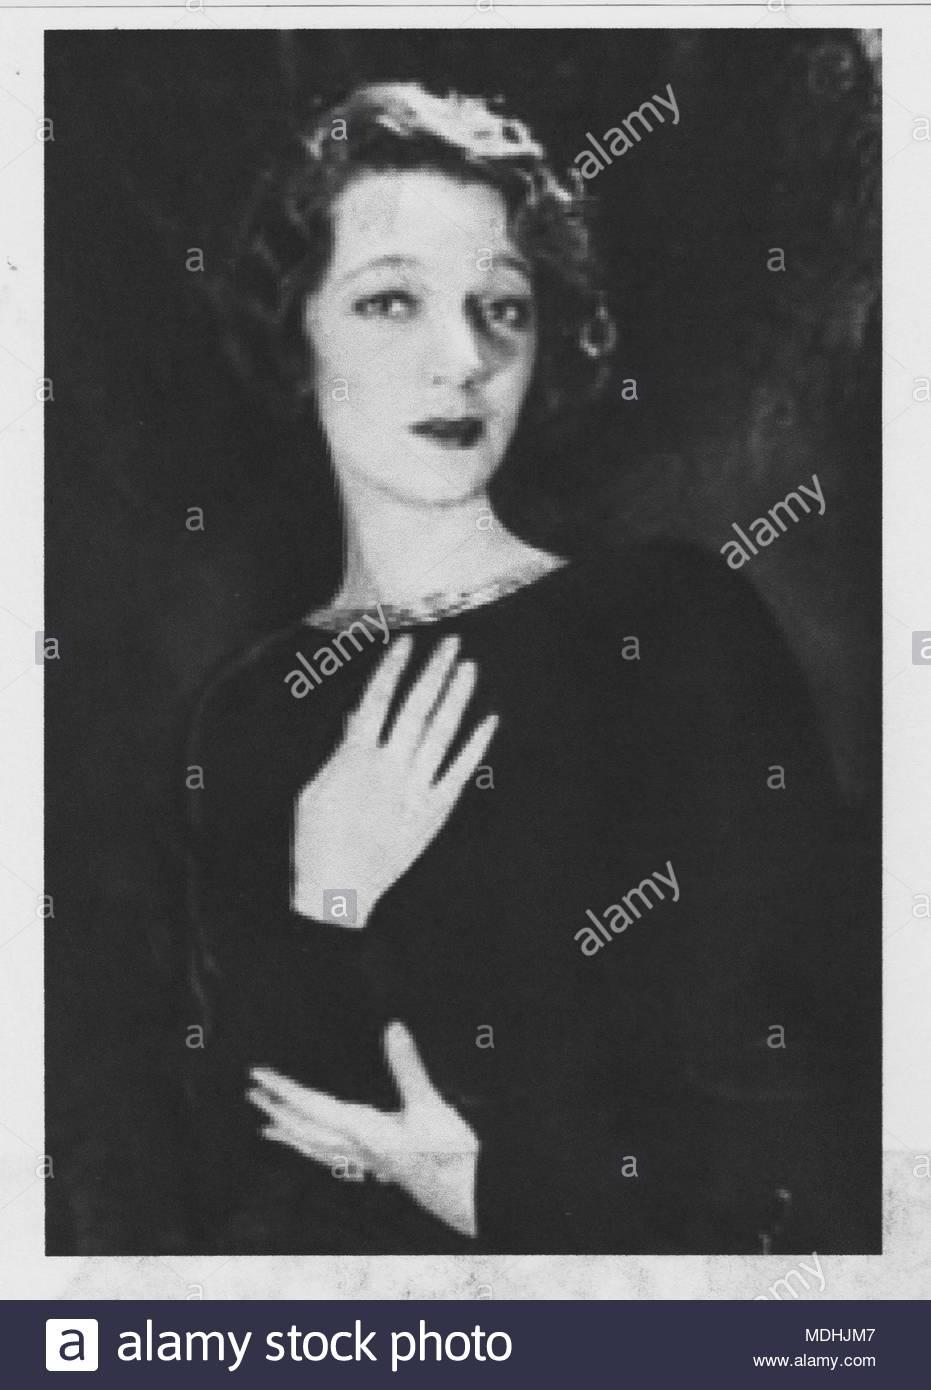 Jenny O'Hara,Belita Erotic photos Elizabeth Taylor (1932?011 (dual citizenship,Sharon Brown (actress)